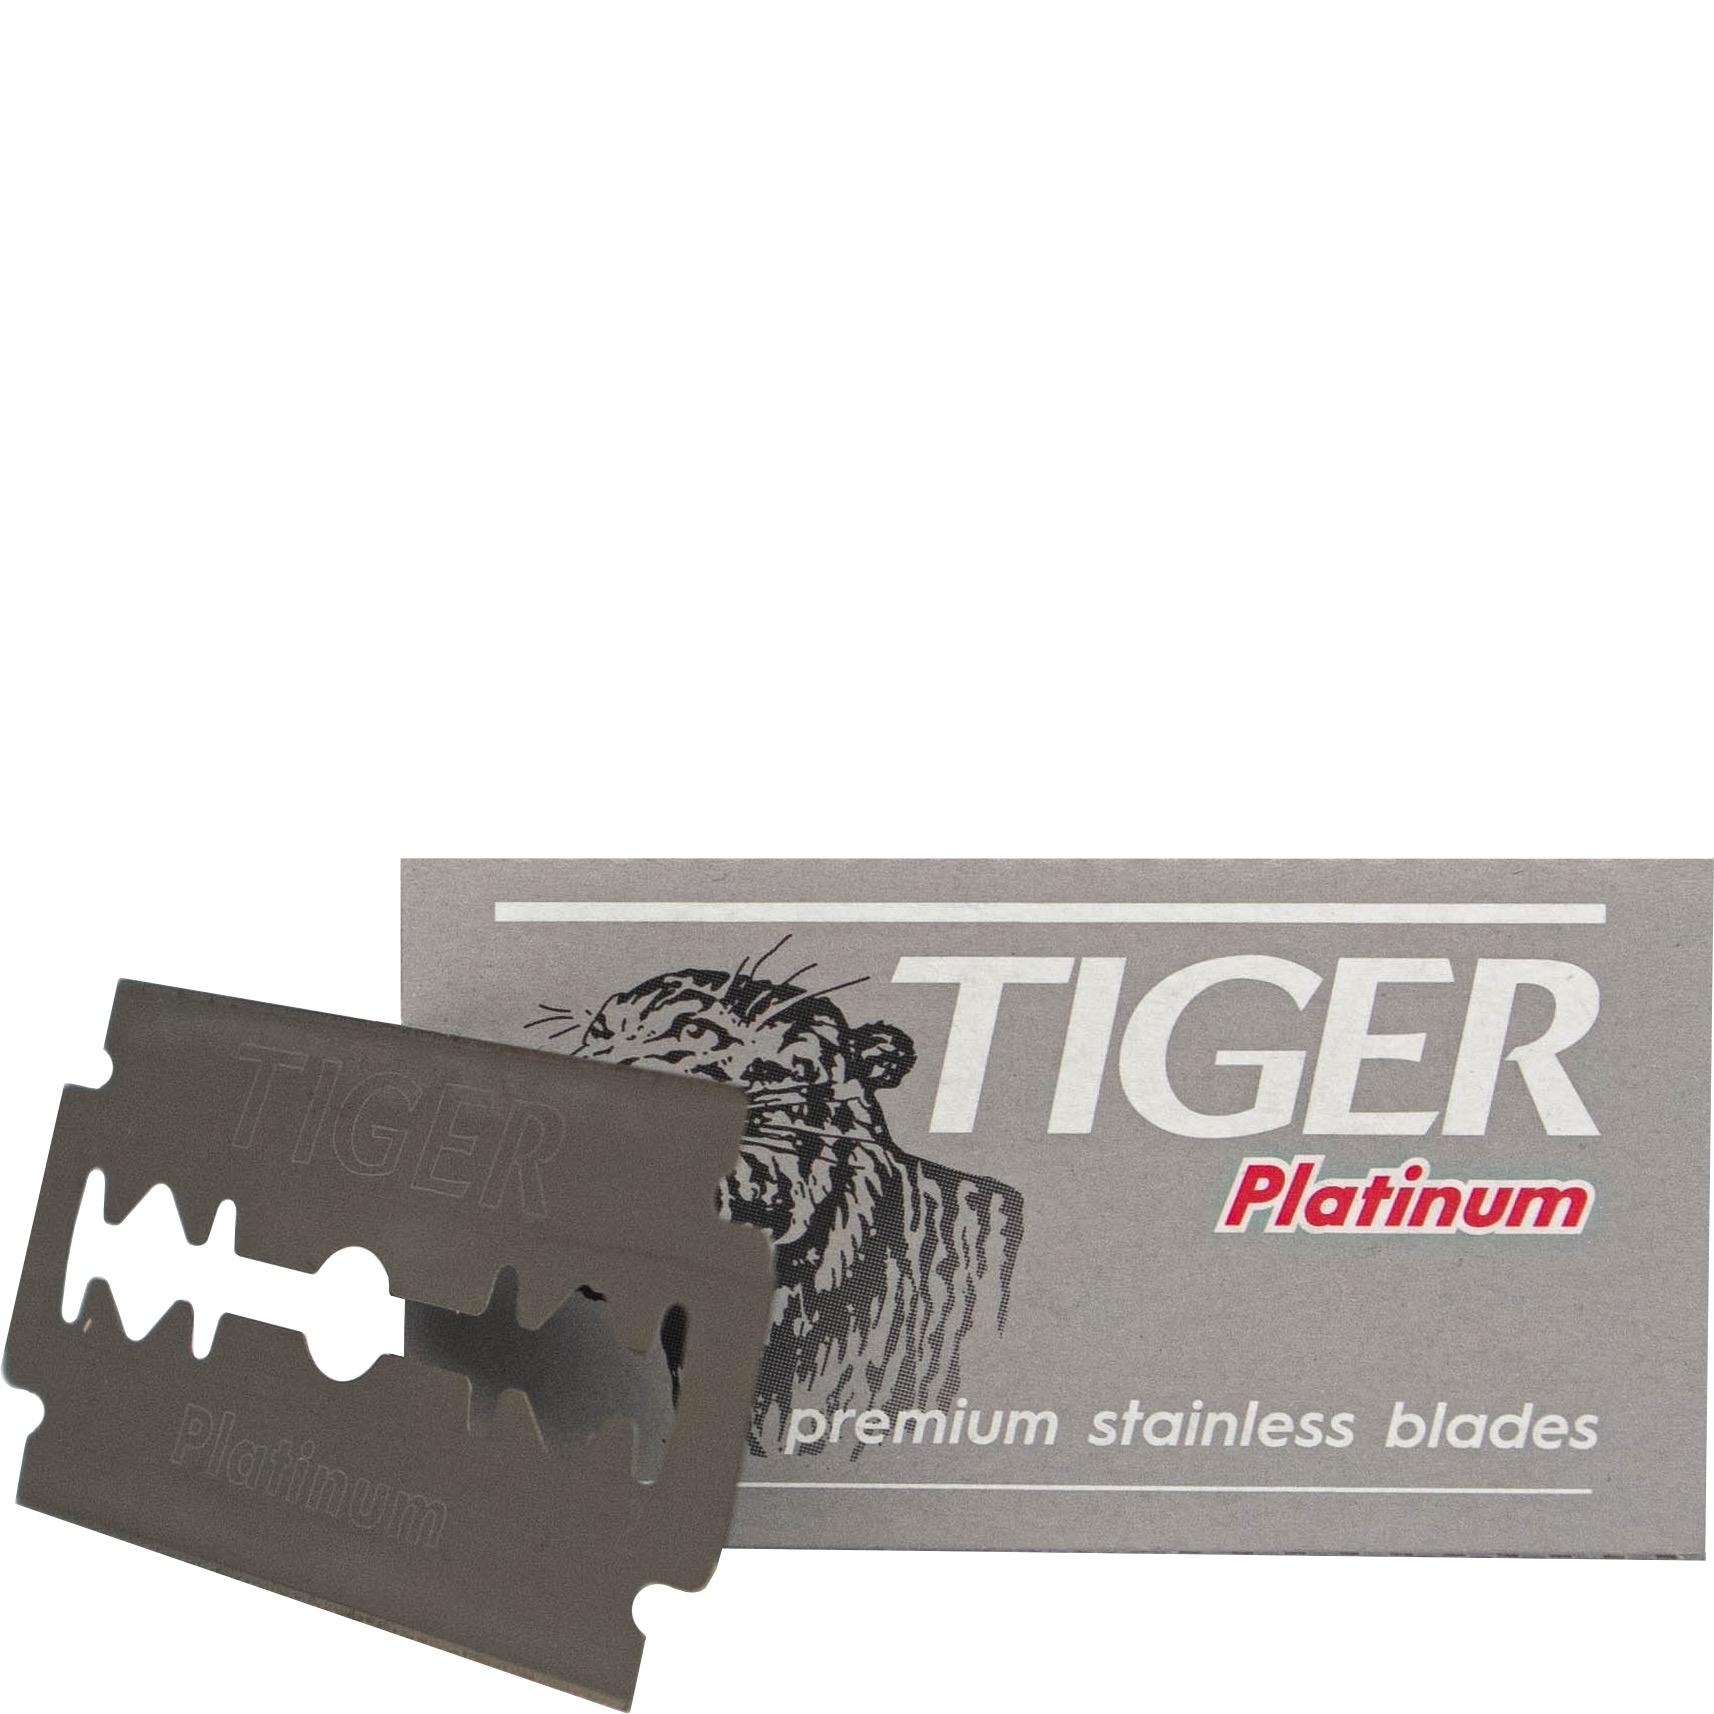 Box - Double Edge Blades Platinum